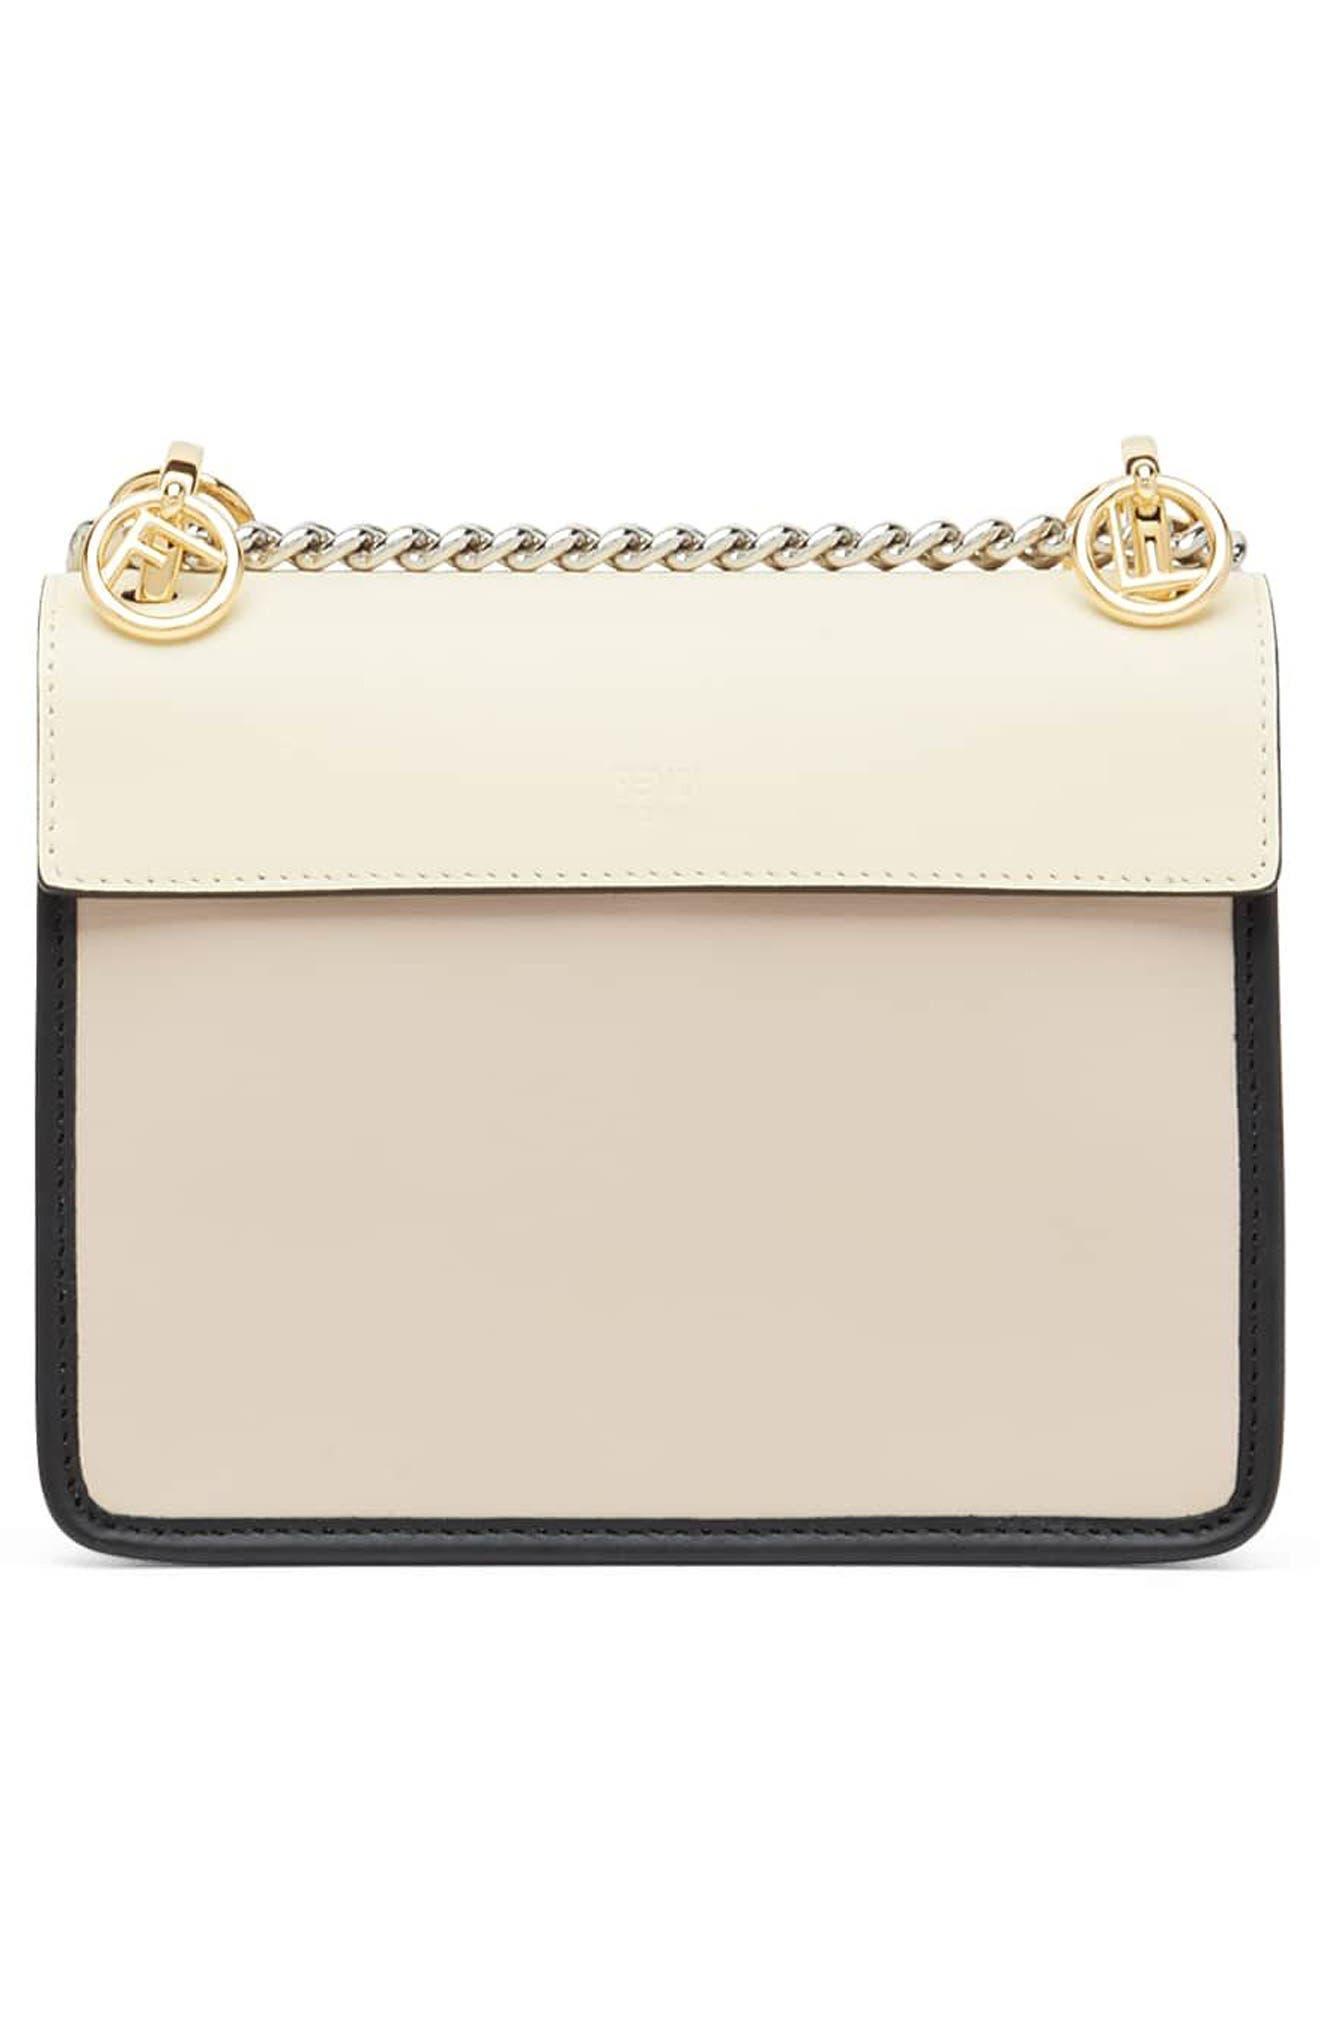 Mini Kan I Colorblock Leather Shoulder Bag,                             Alternate thumbnail 2, color,                             650